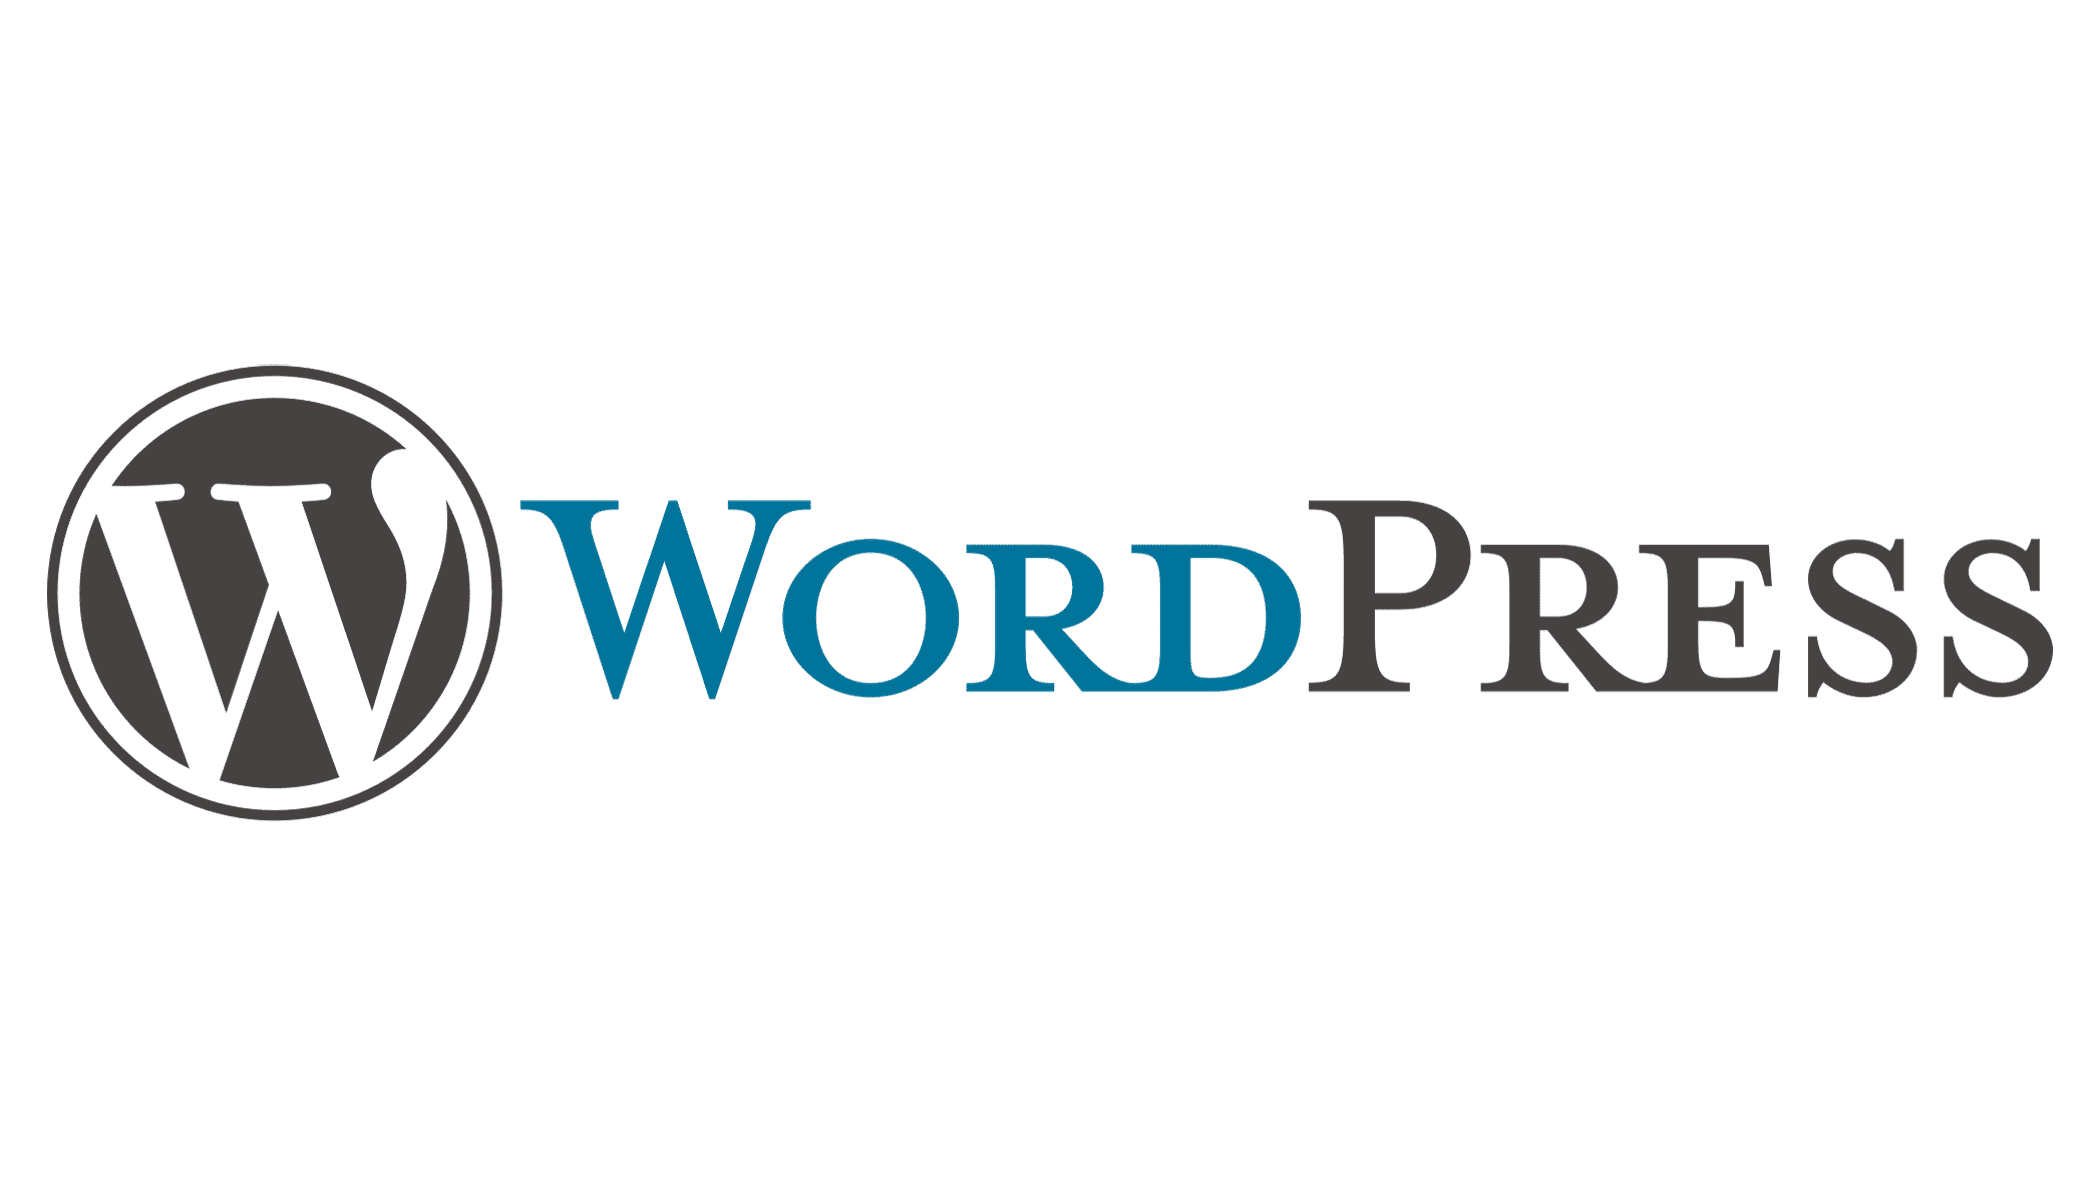 Développement web et SEO sous wordpress